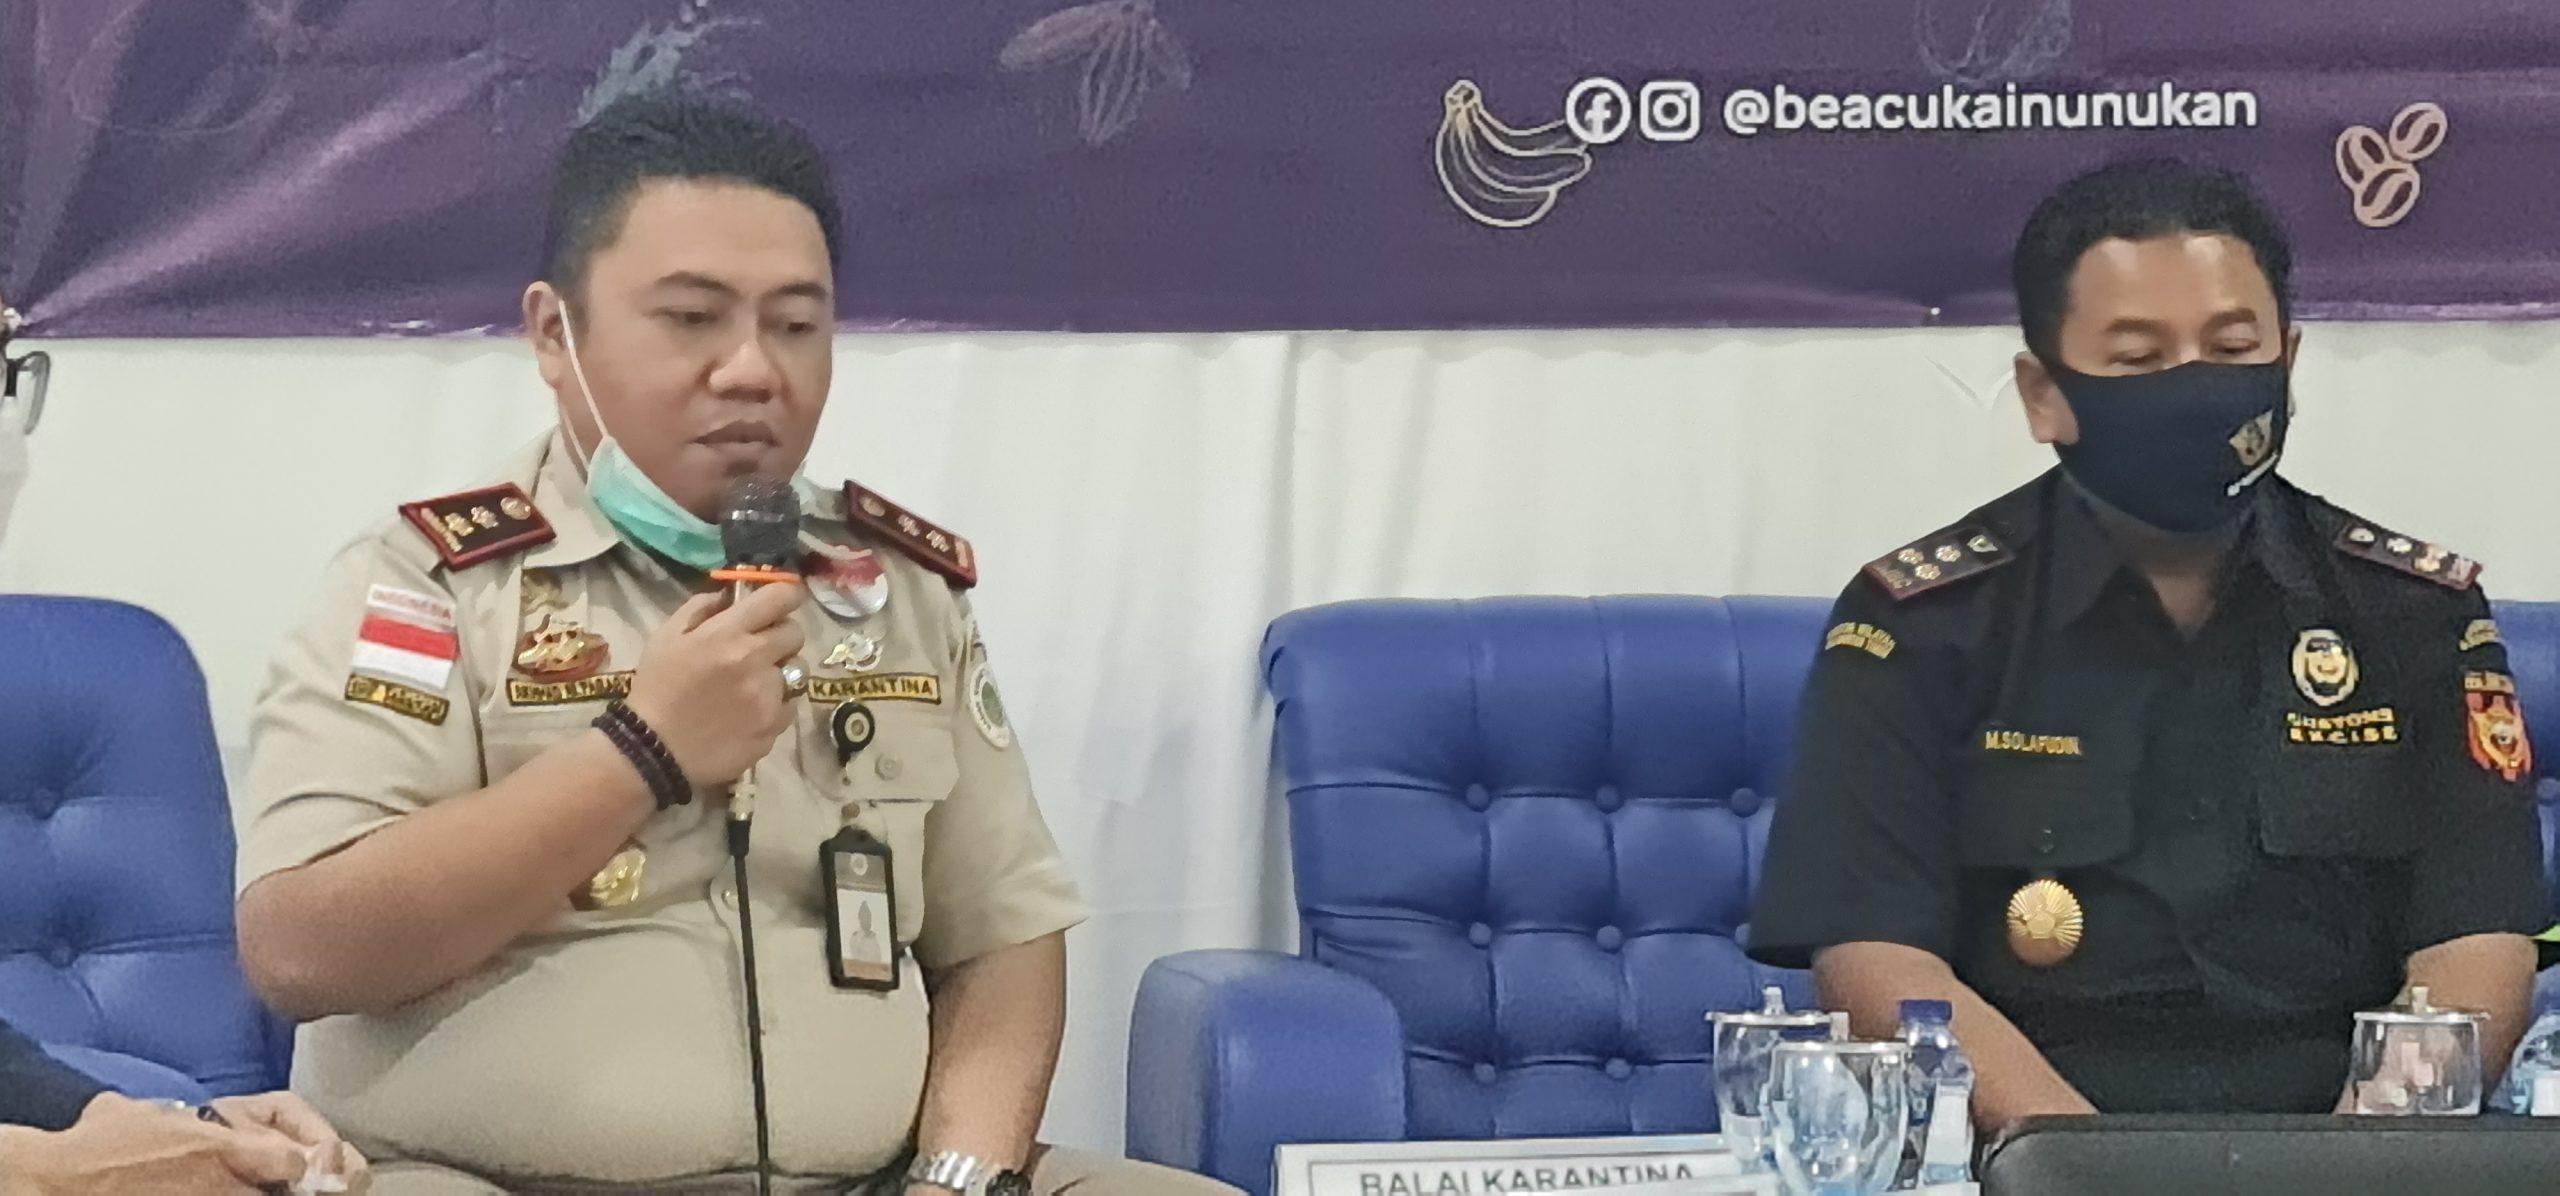 Fokus Group Discusion Bea Cukai Nunukan